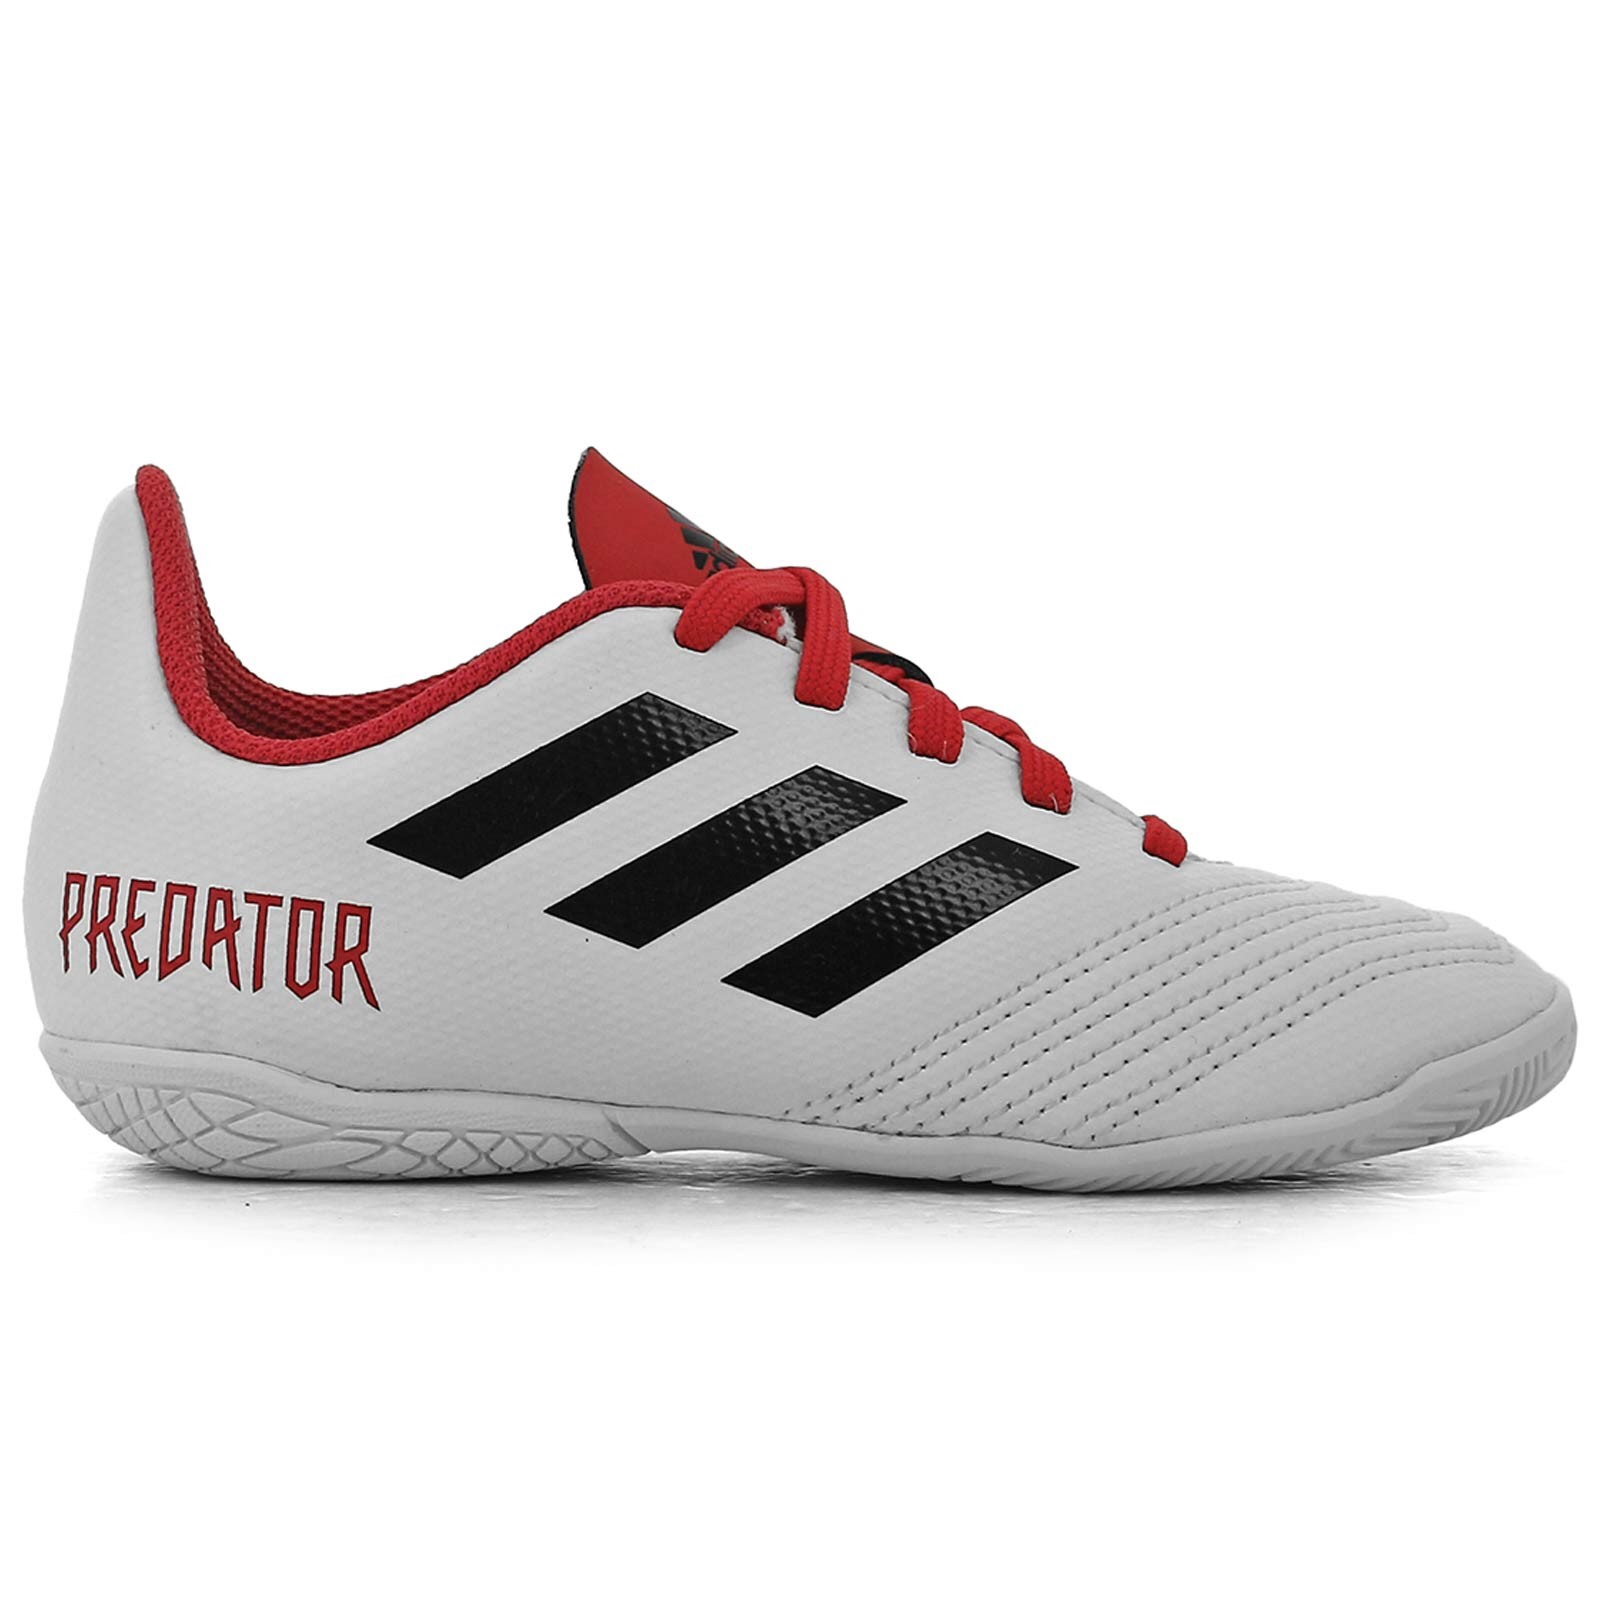 Shop Indoor Boots - The Football Factory 0ca990c81